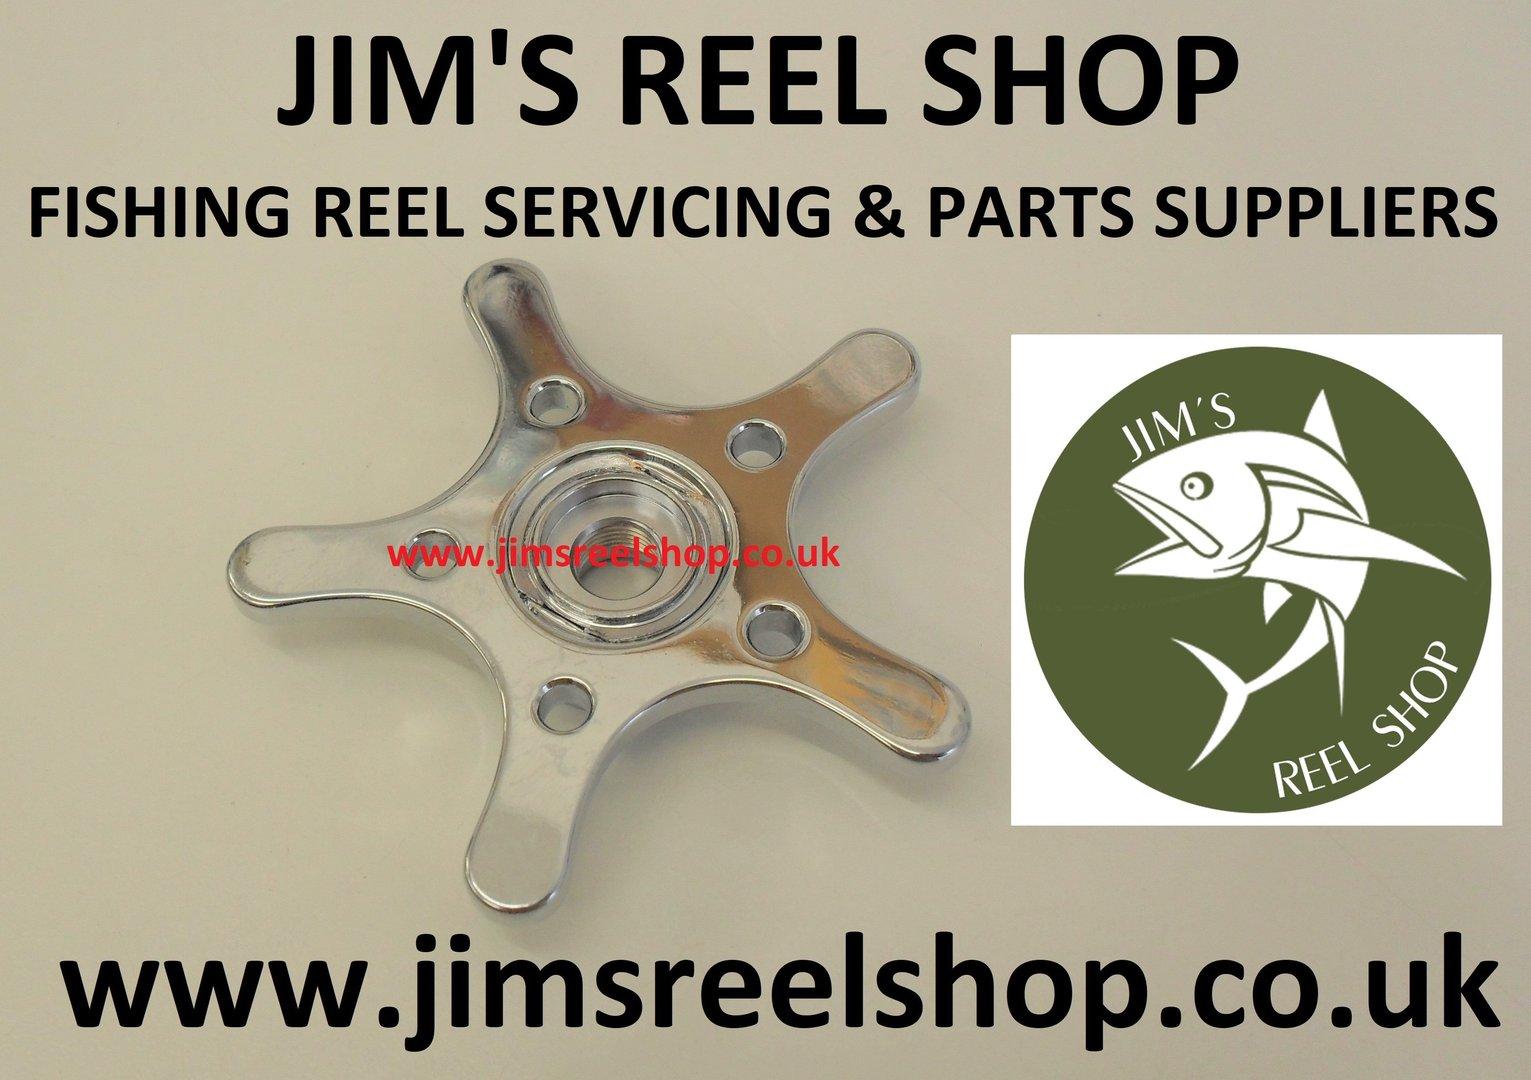 434c5ce7442 DAIWA SALTIST 30TH/40H/50H STAR DRAG # G60-5301 - Jim's Reel Shop